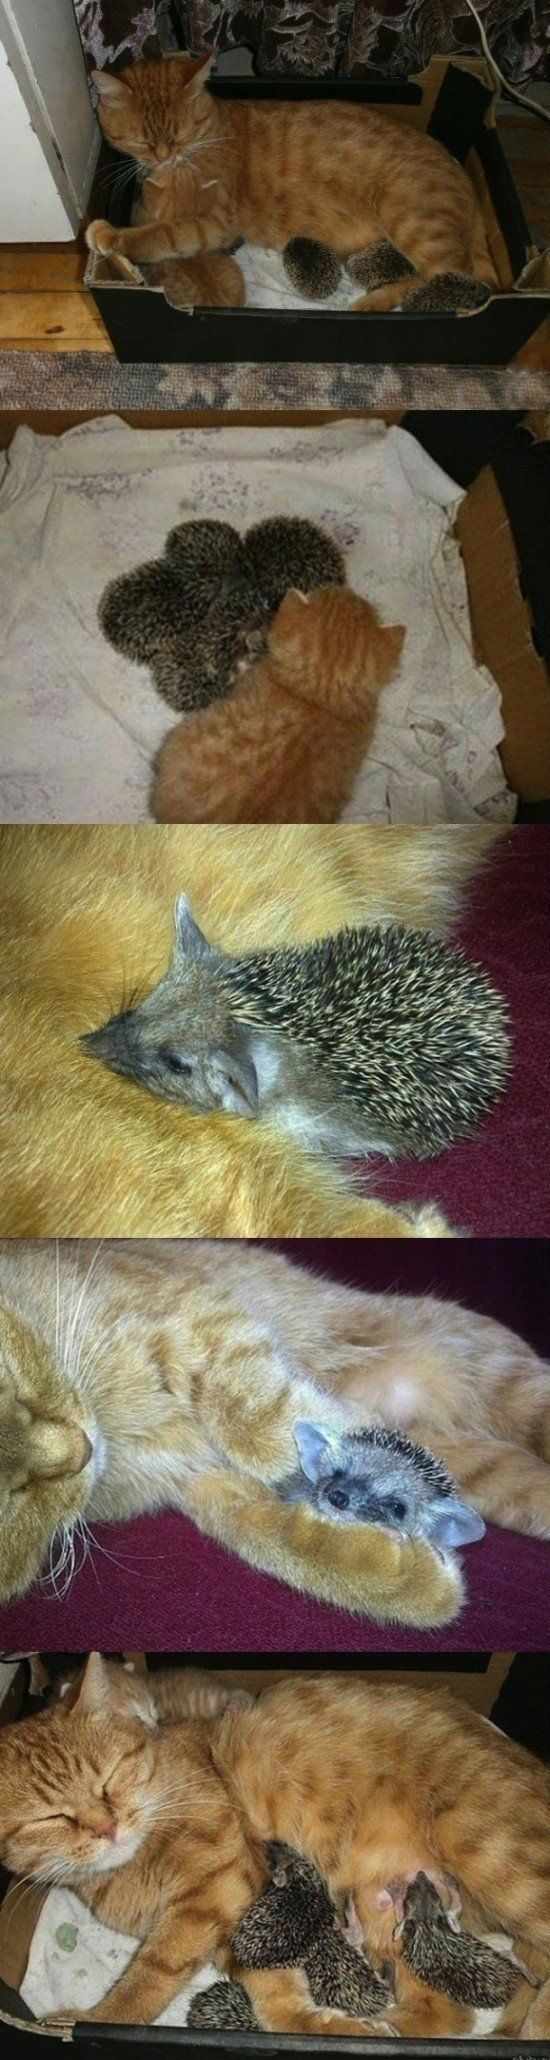 Katze zieht Igelbabies groß - Win Bild - Webfail